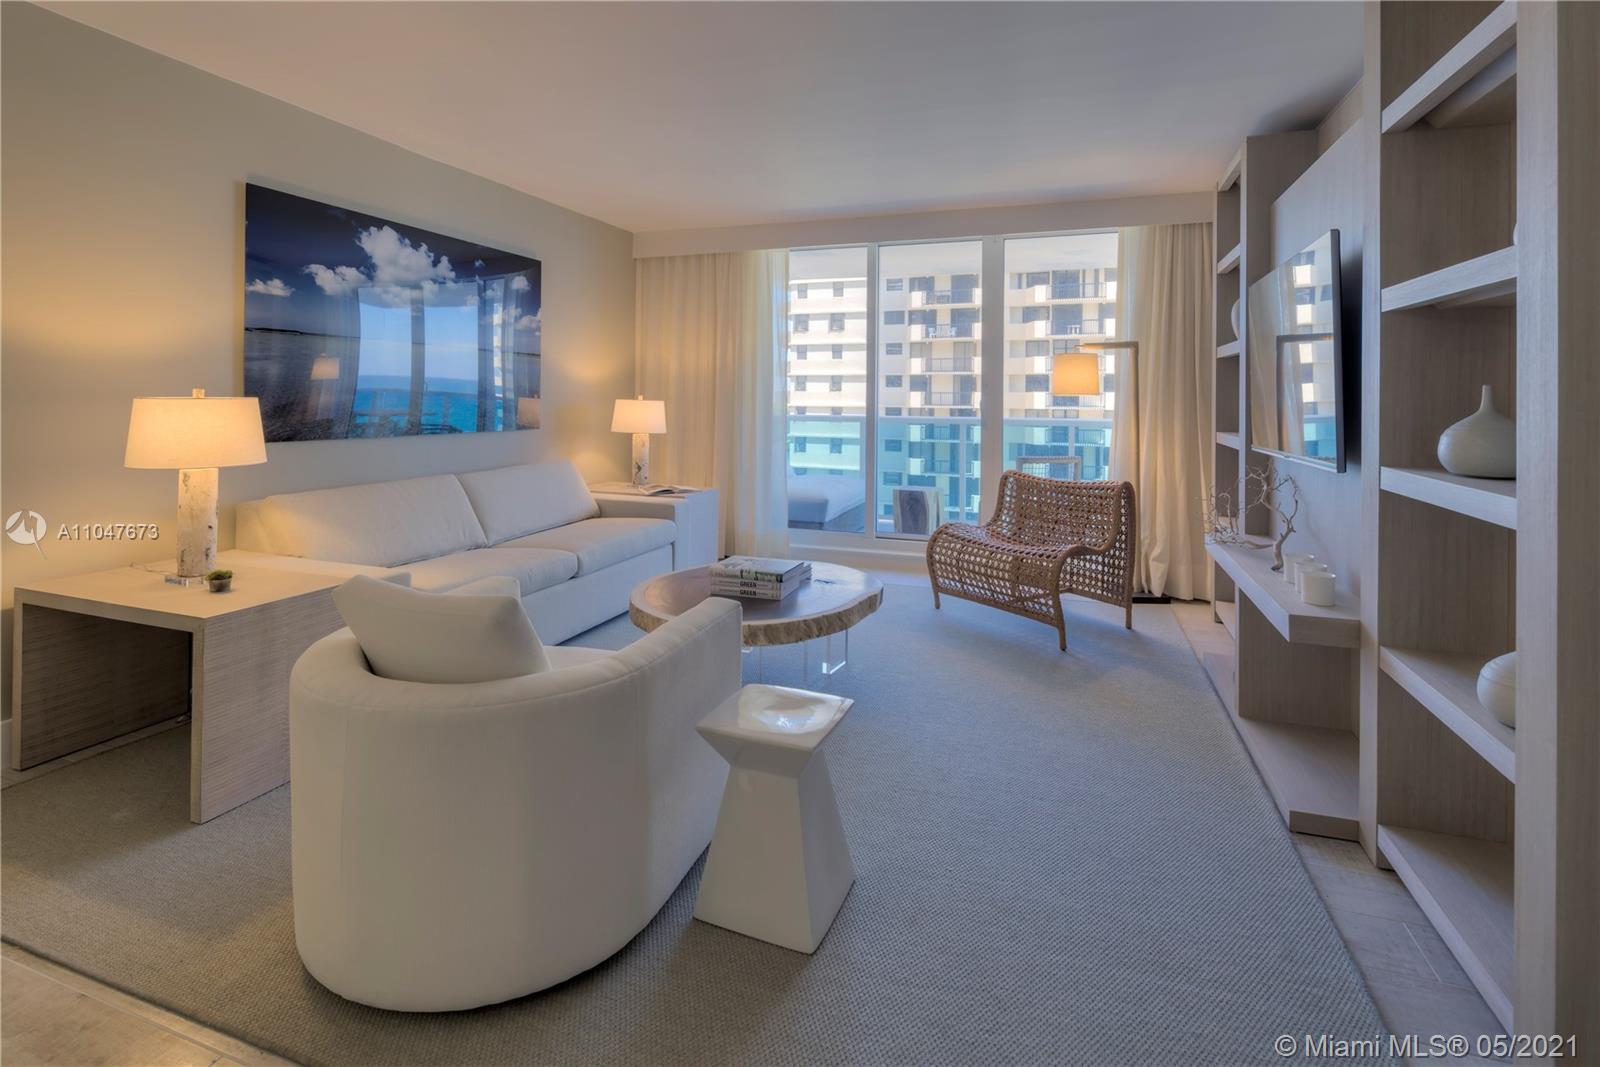 1 Hotel & Homes #1009 - 102 24th St #1009, Miami Beach, FL 33139